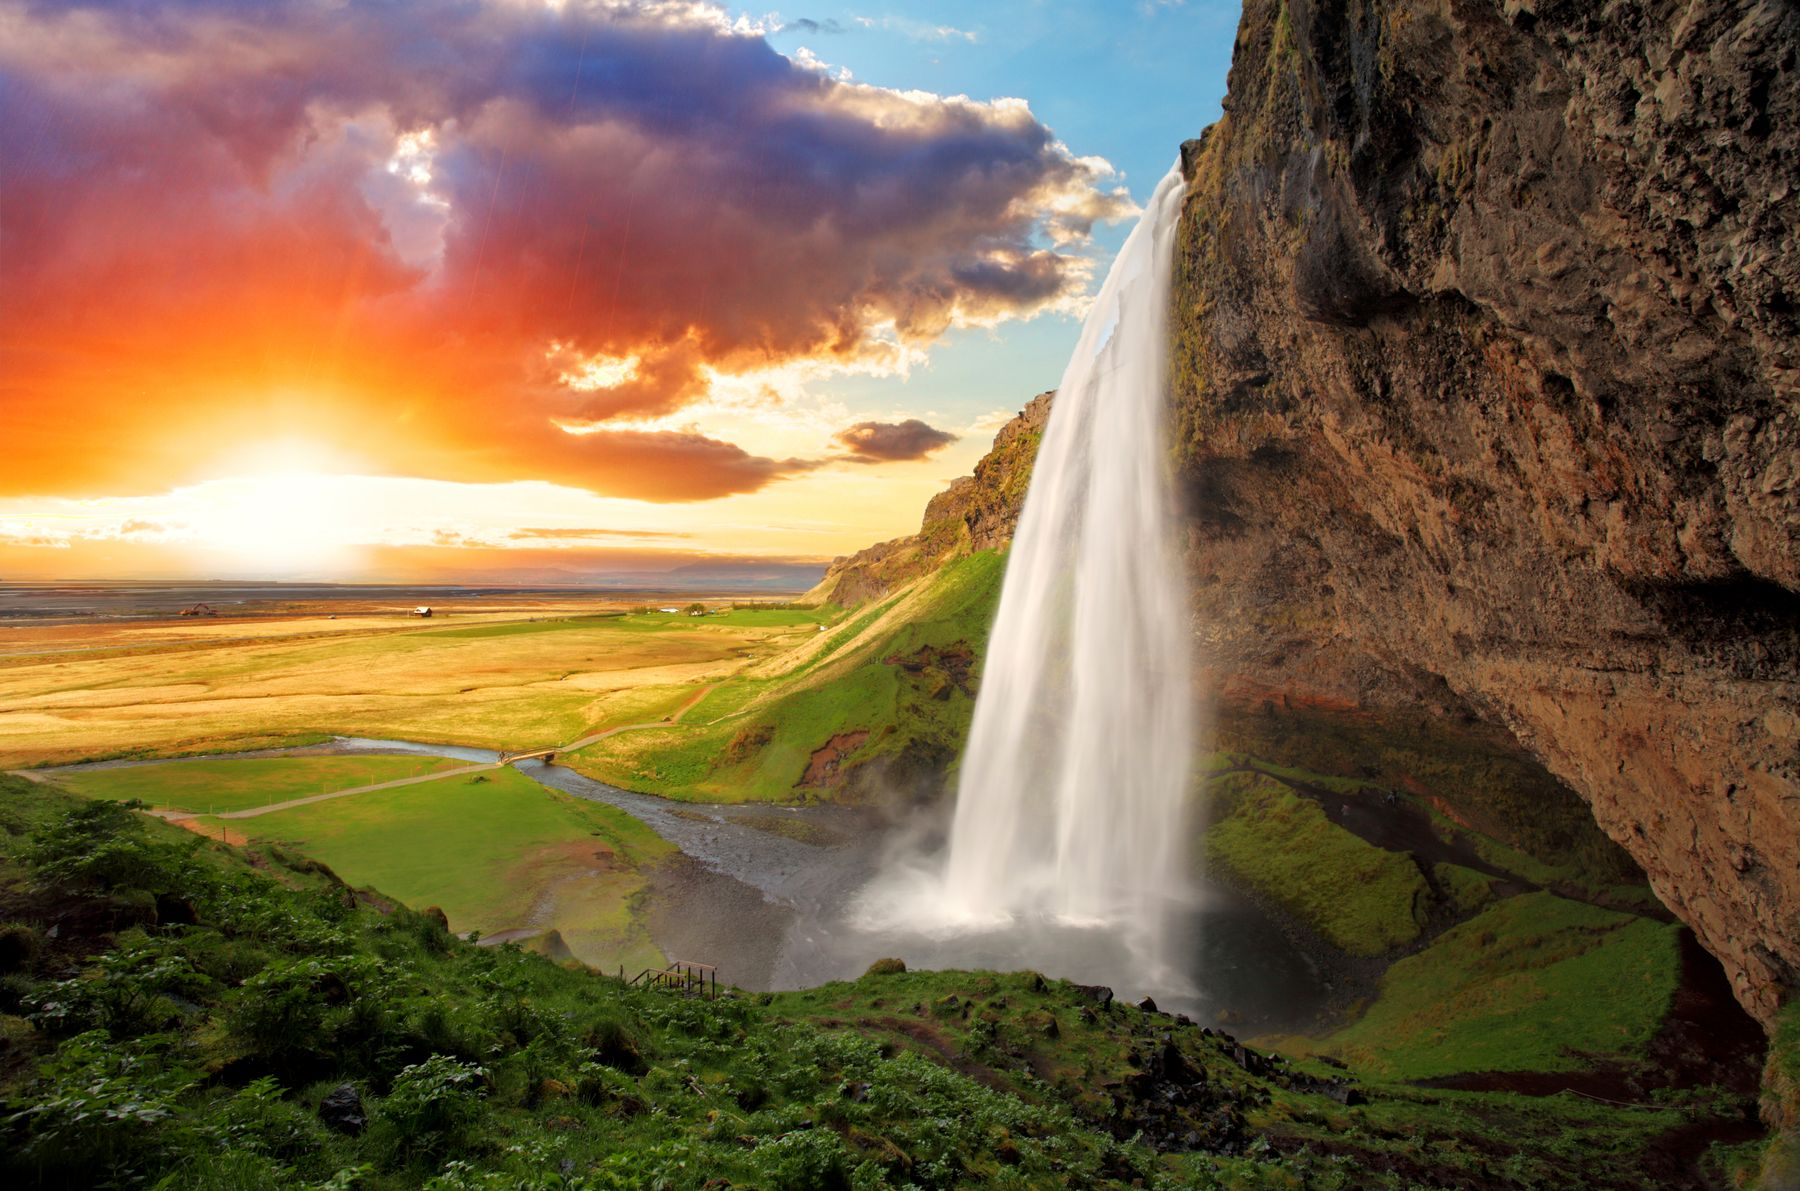 Исландский пейзаж с водопадом на закате